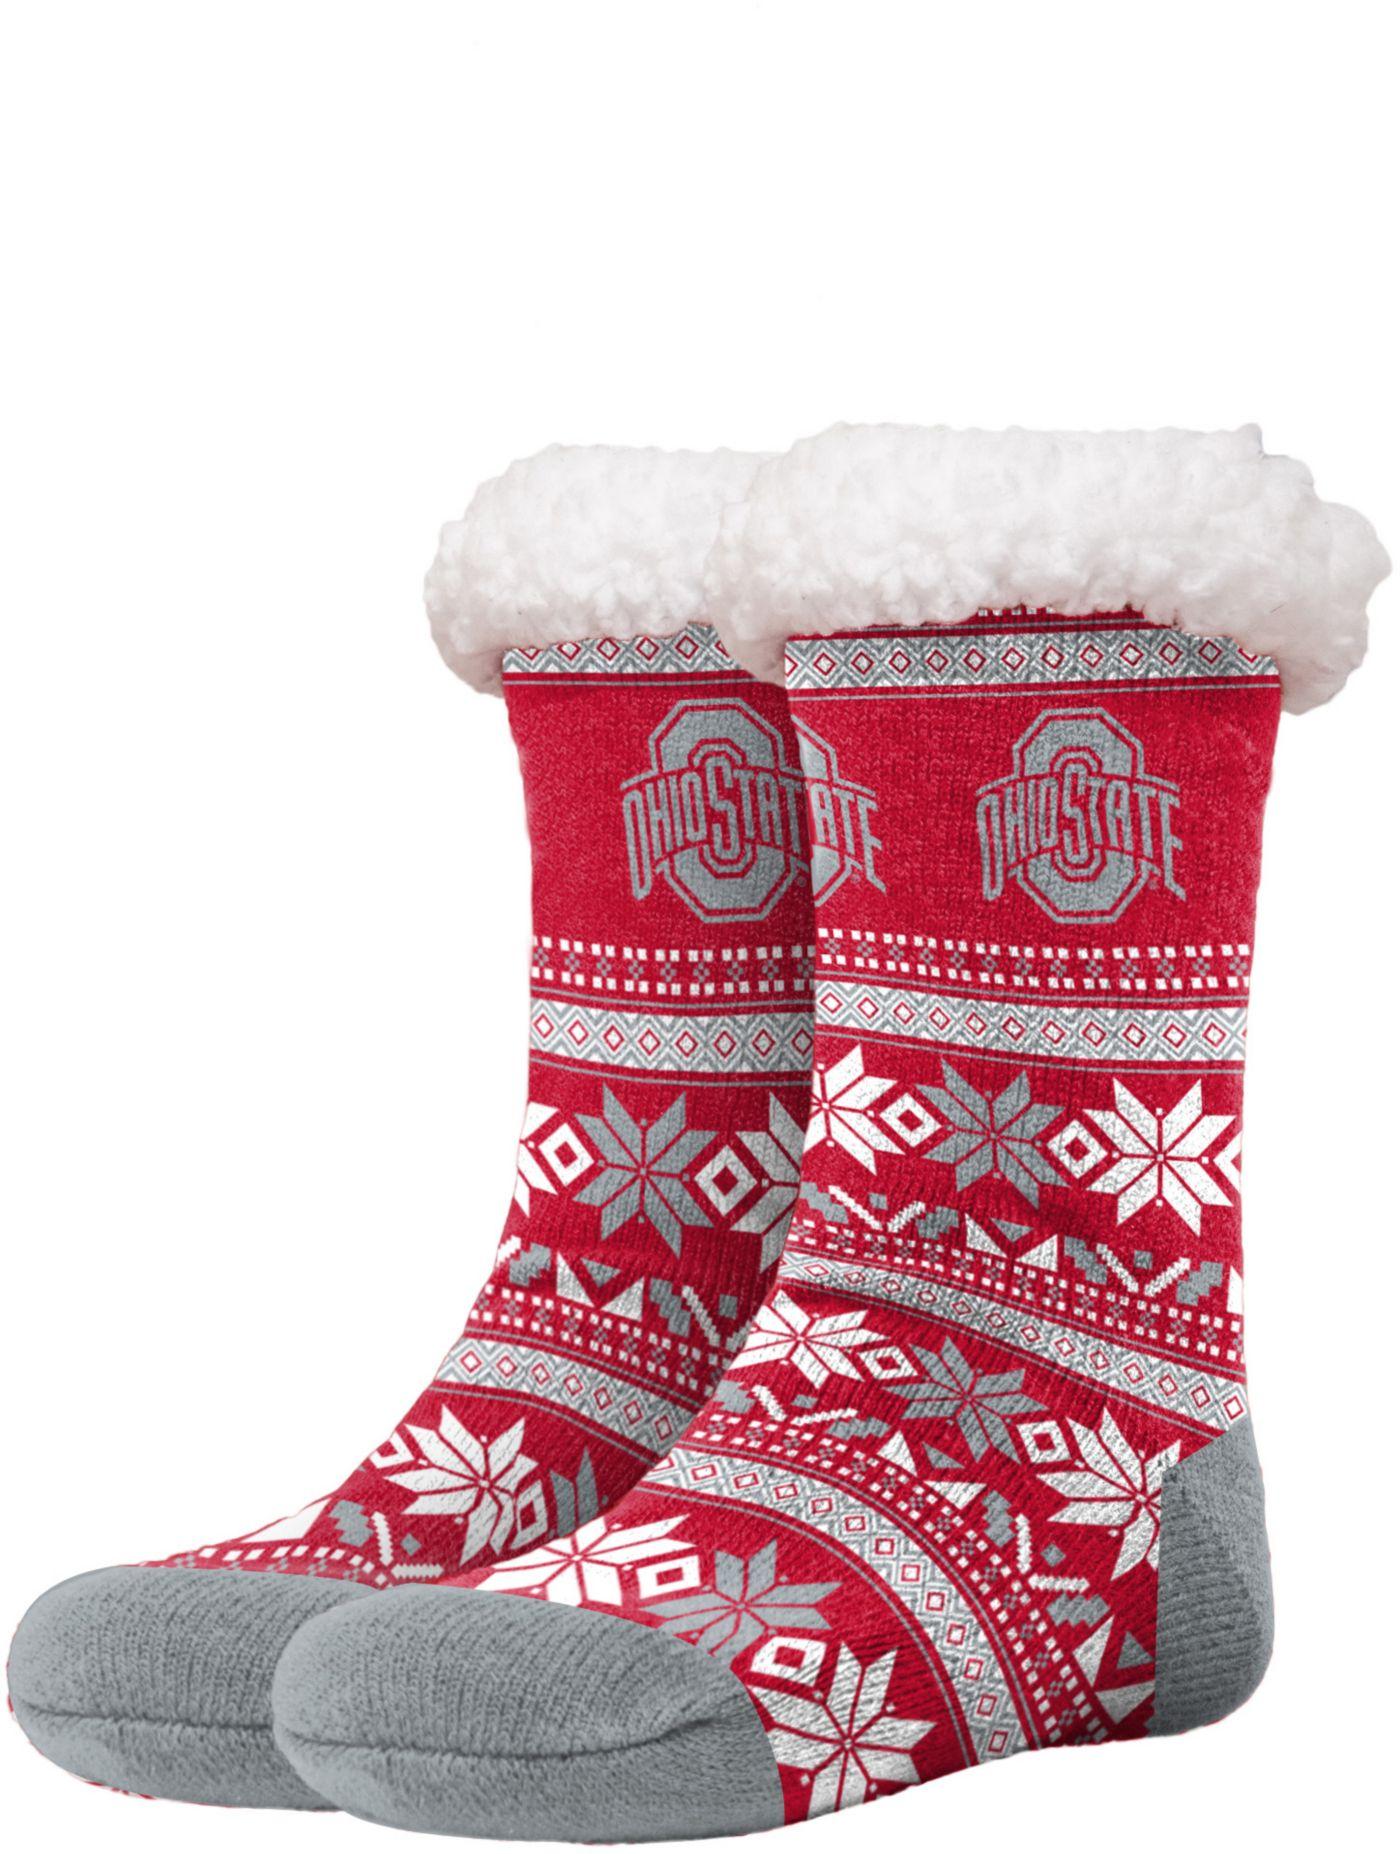 FOCO Ohio State Buckeyes Footy Slippers